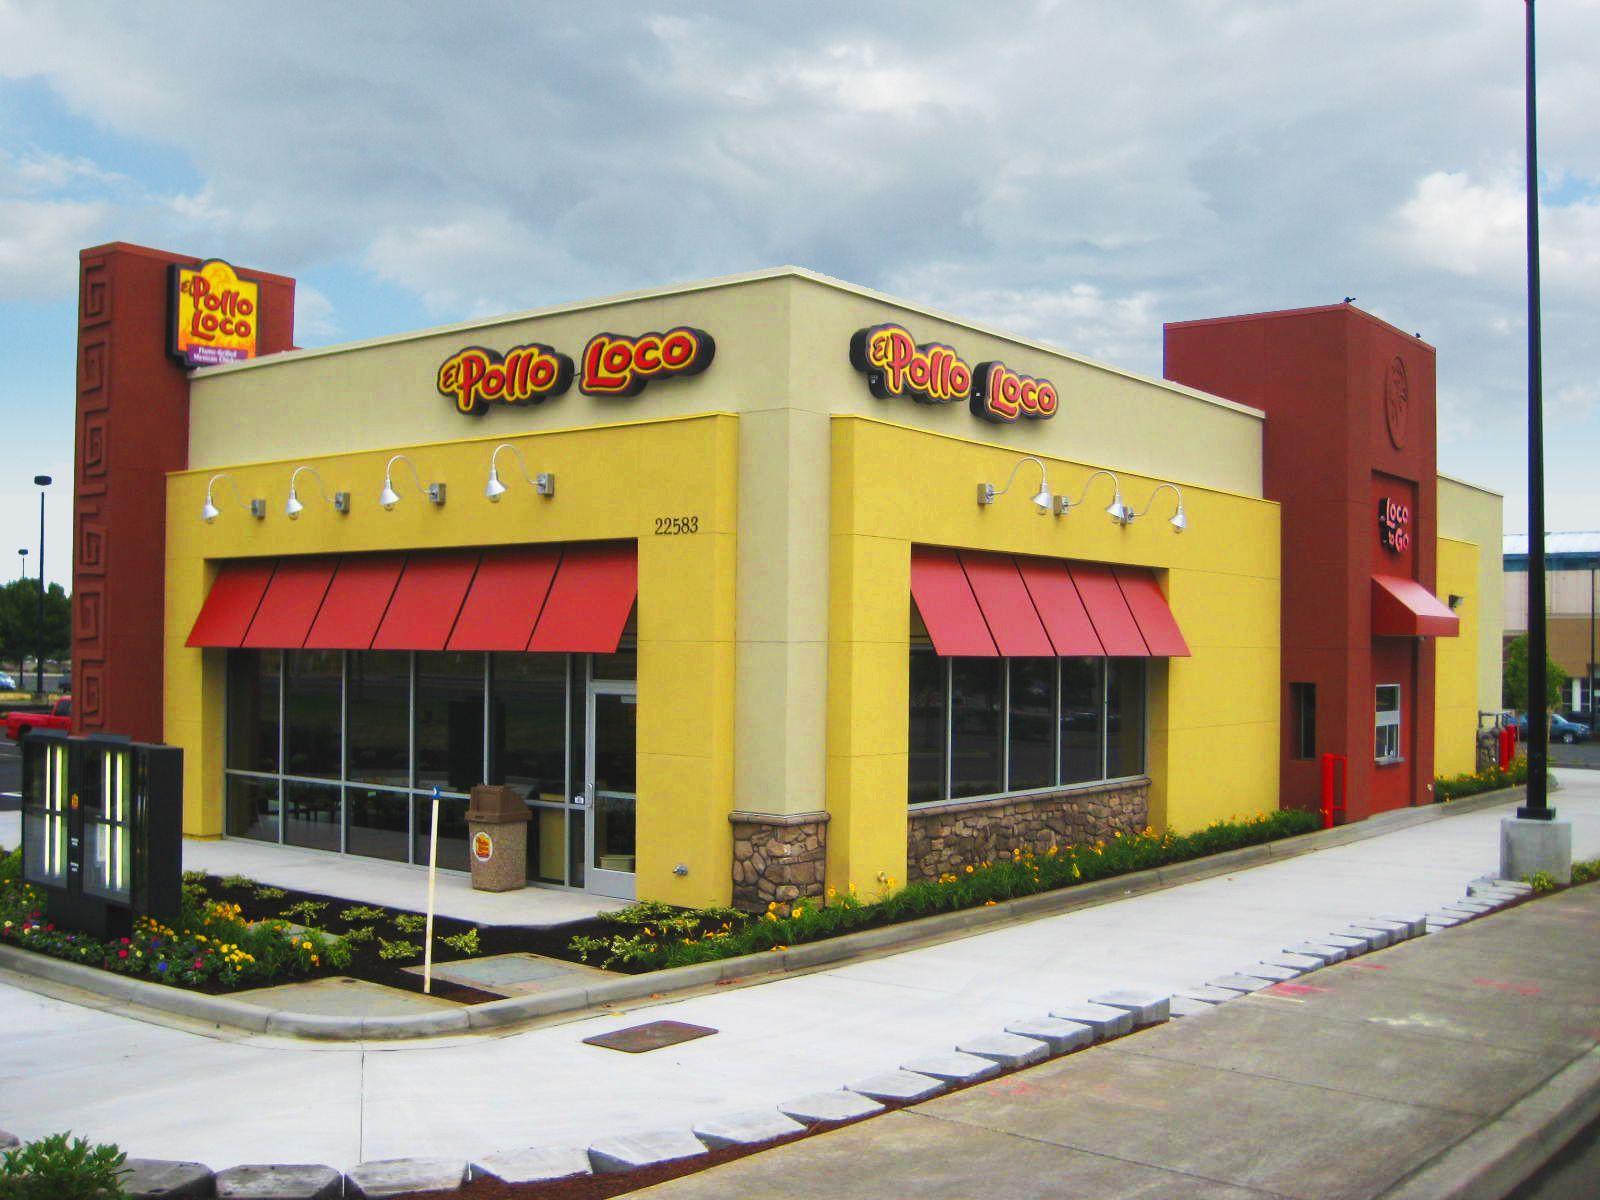 View source image Fast food restaurant, Restaurant